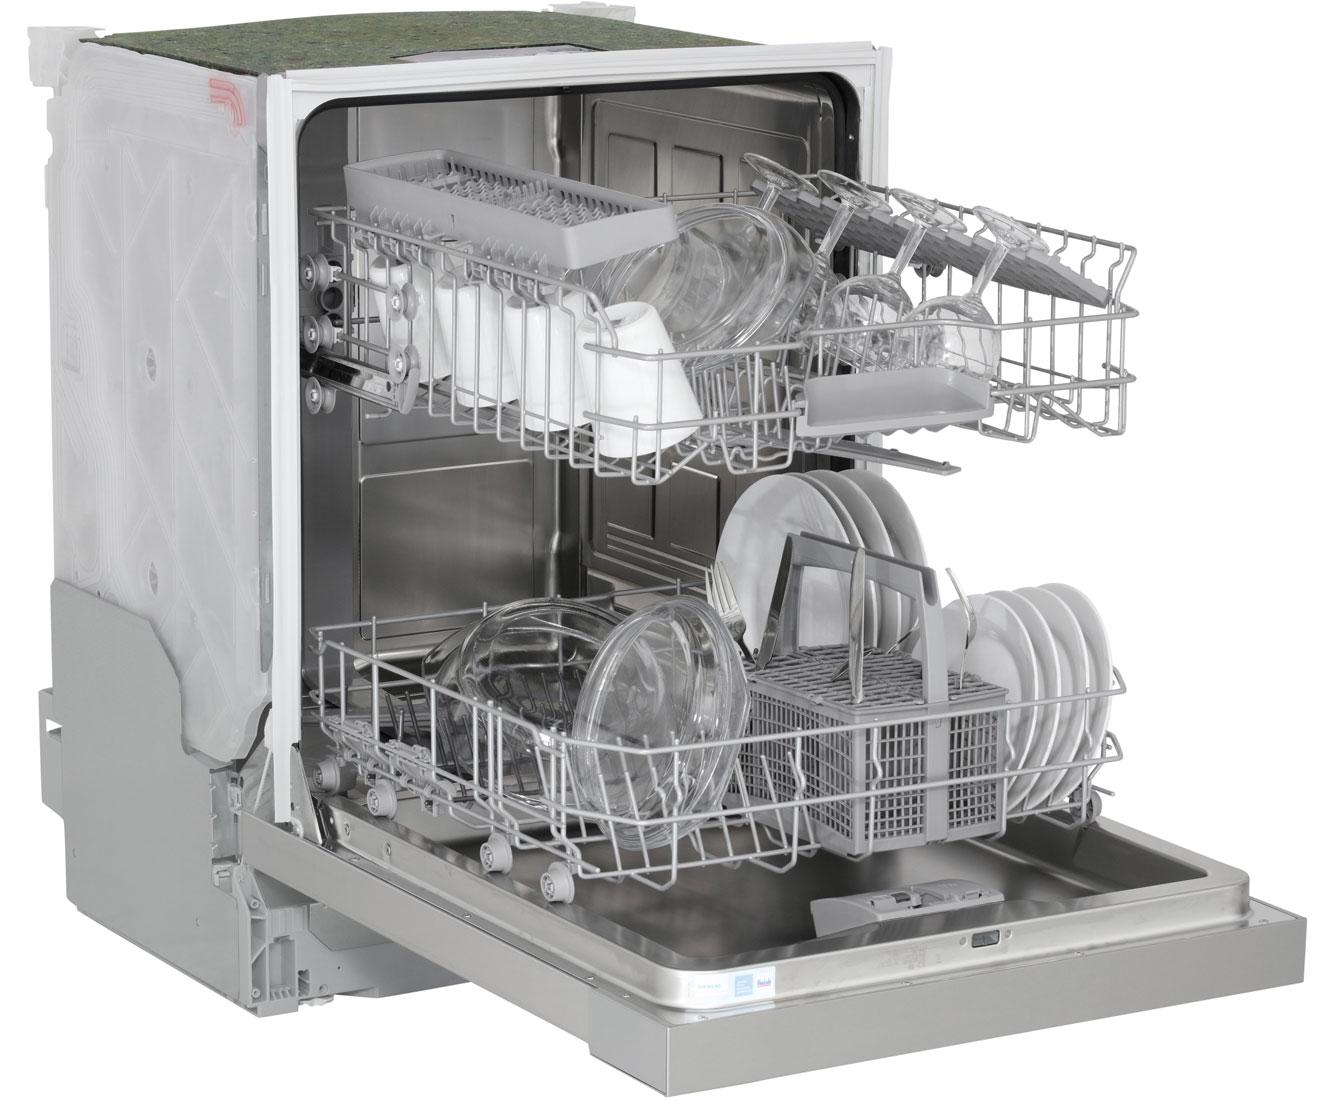 Siemens sn s ce unterbau geschirrspüler cm edelstahl anleitung